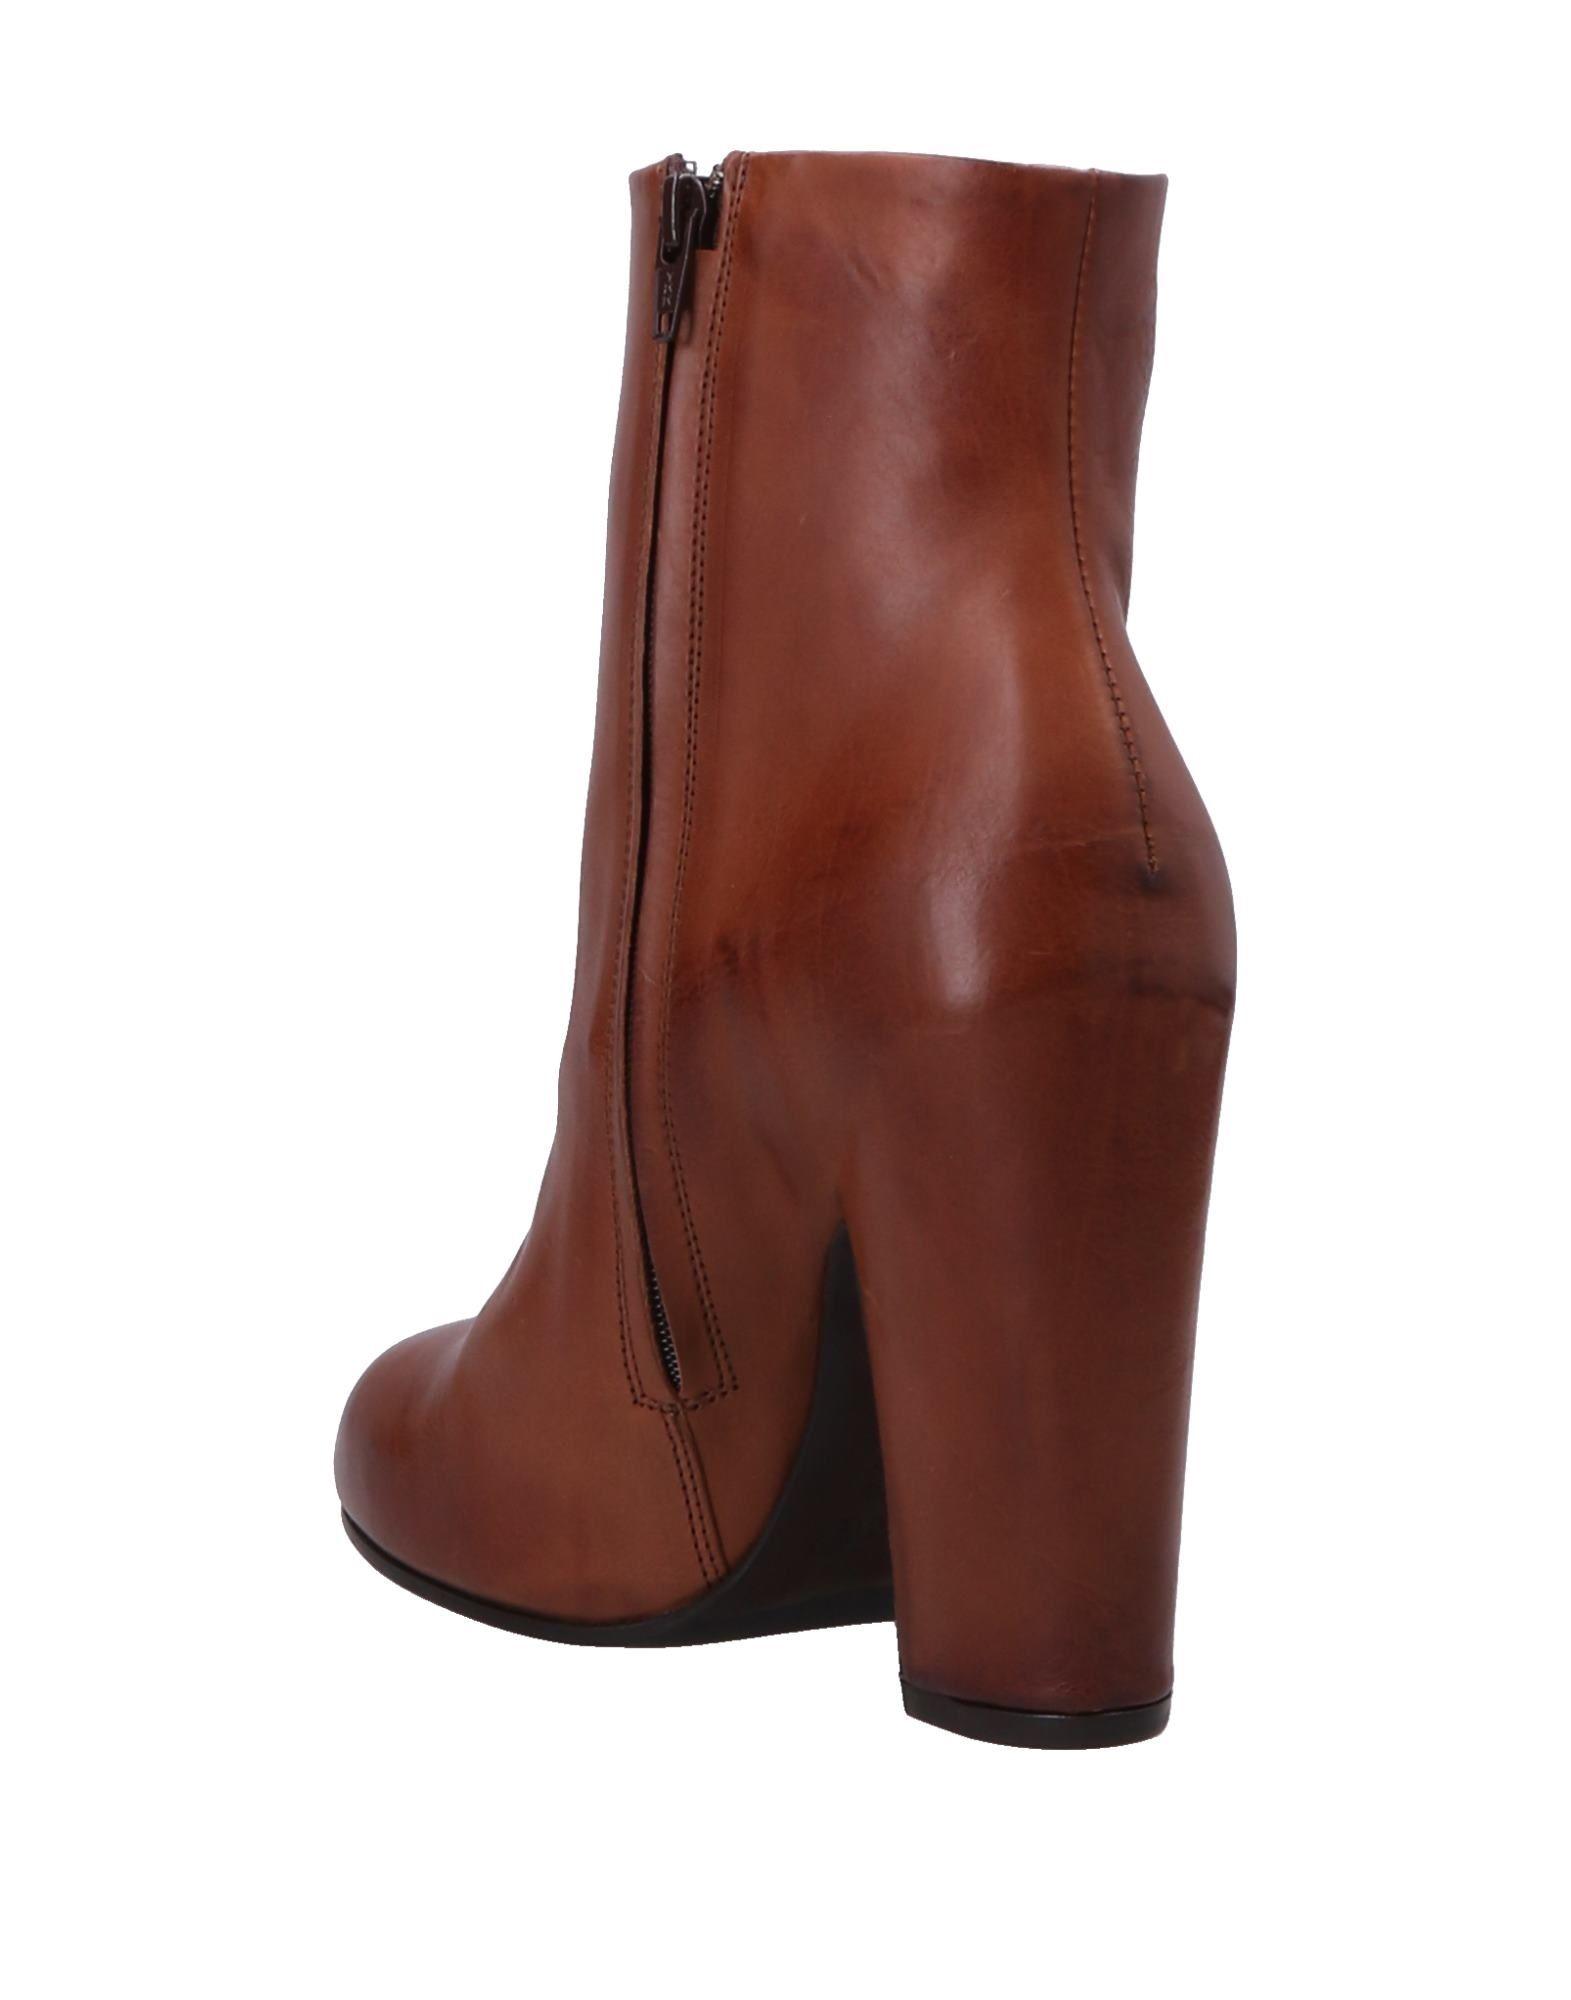 Vic Matiē Stiefelette Damen strapazierfähige  11275964URGut aussehende strapazierfähige Damen Schuhe ad3094